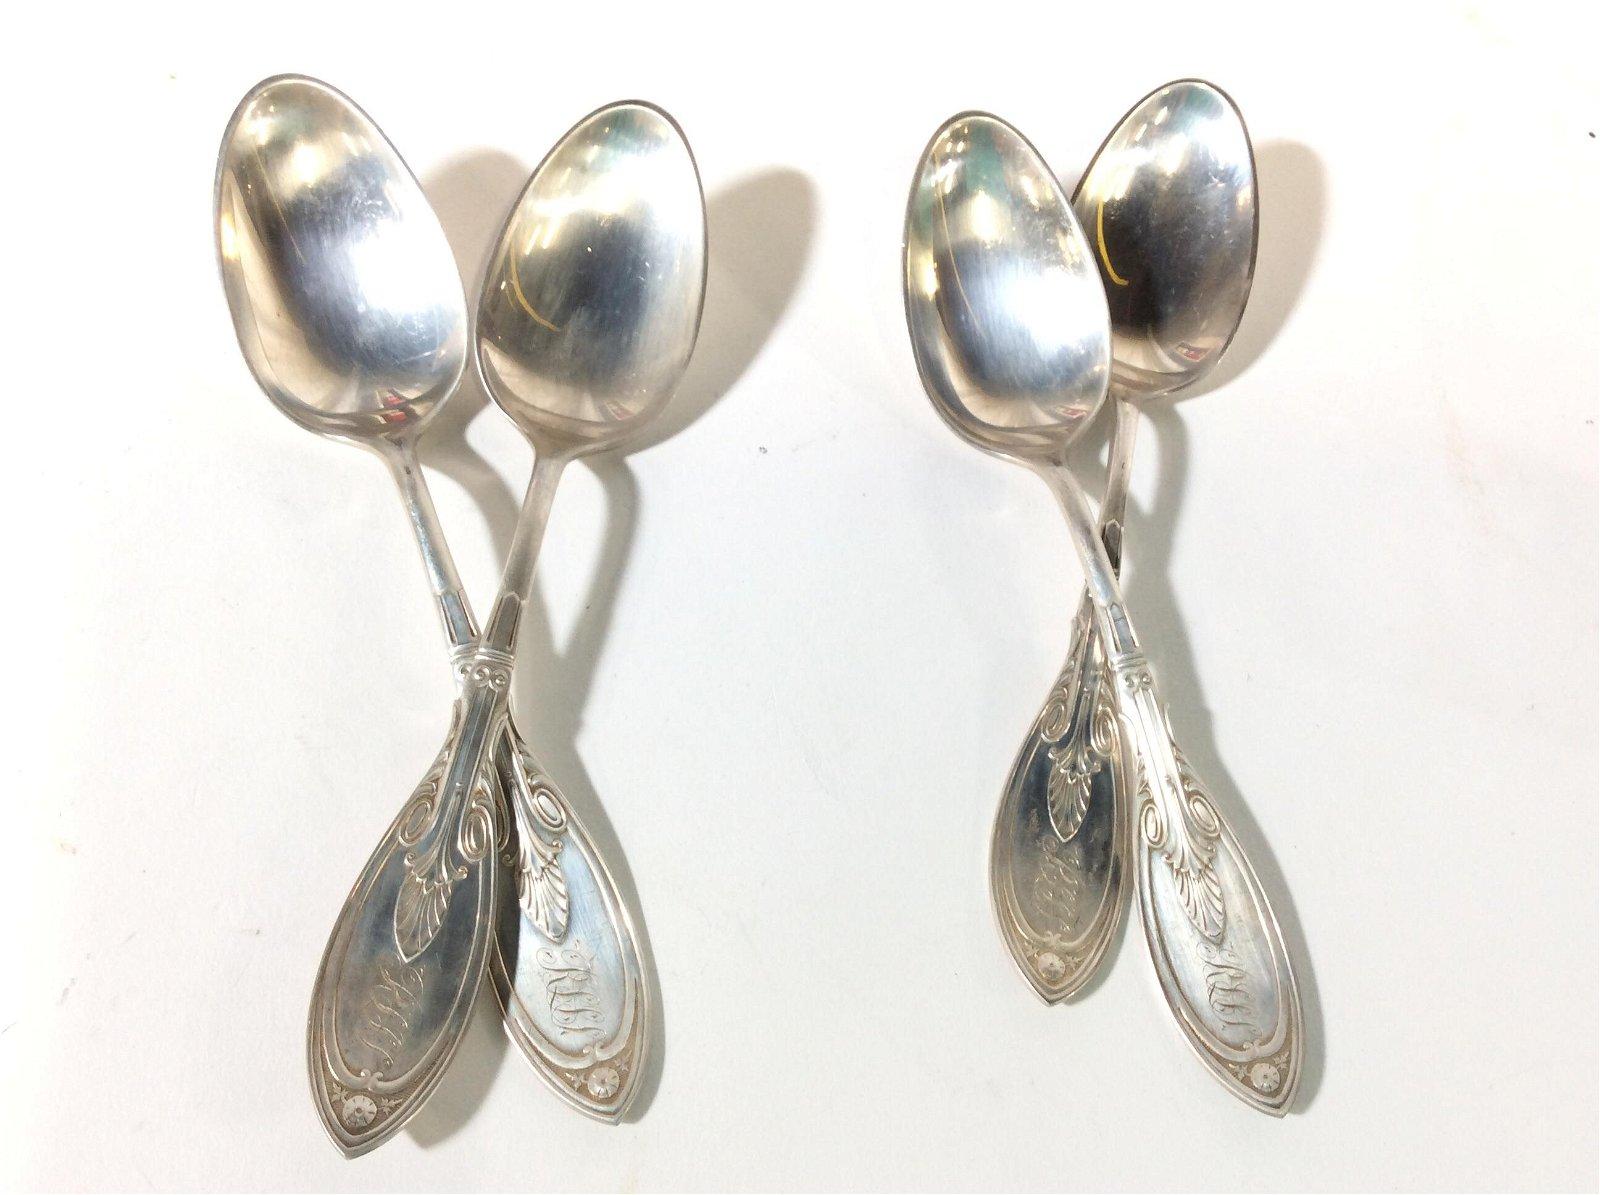 J. Polhamus for Tiffany & Co. Sterling Spoon Set 4